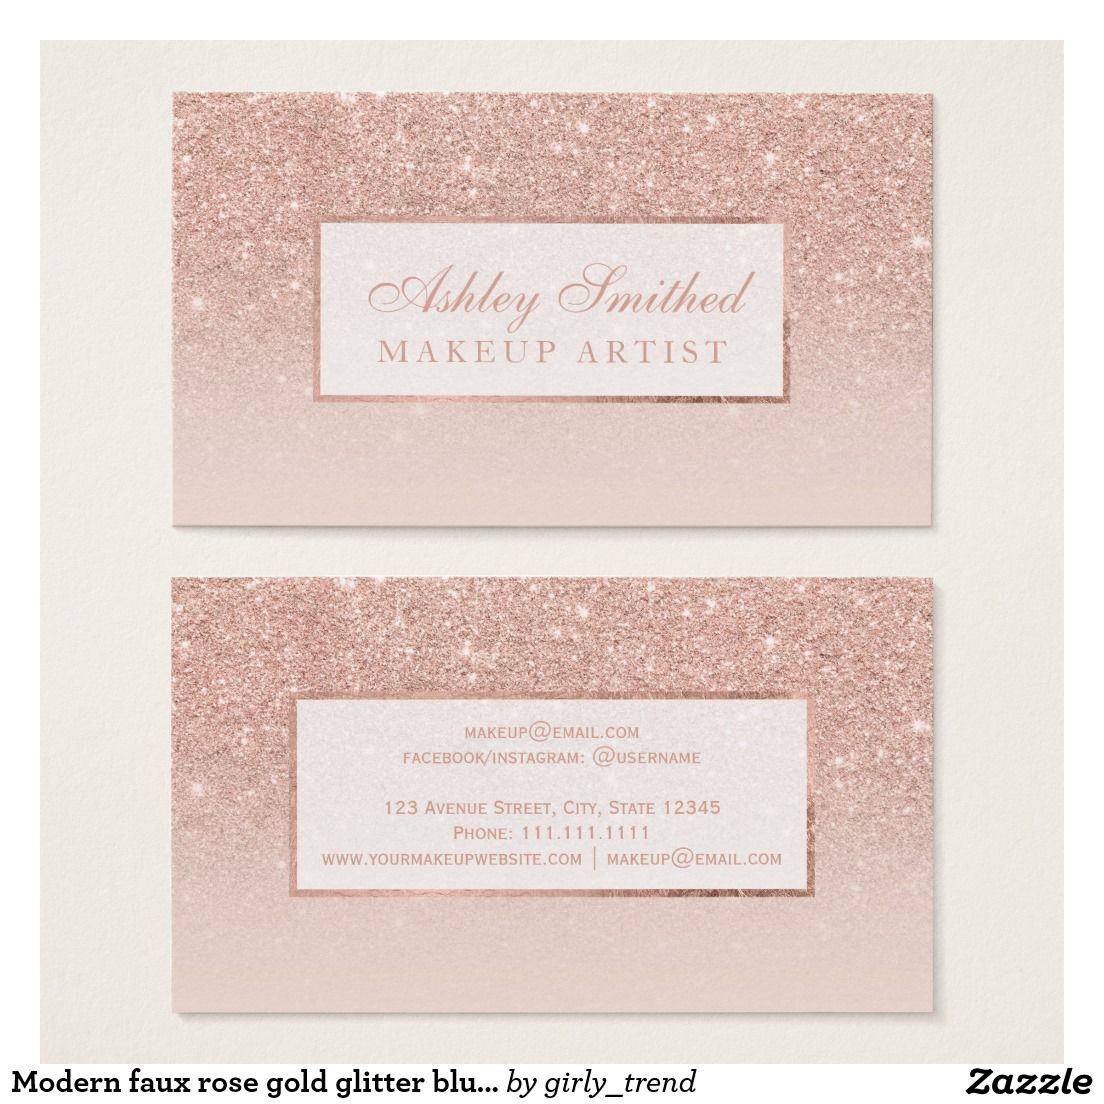 Modern faux rose gold glitter blush ombre makeup business card modern faux rose gold glitter blush ombre makeup business card magicingreecefo Gallery